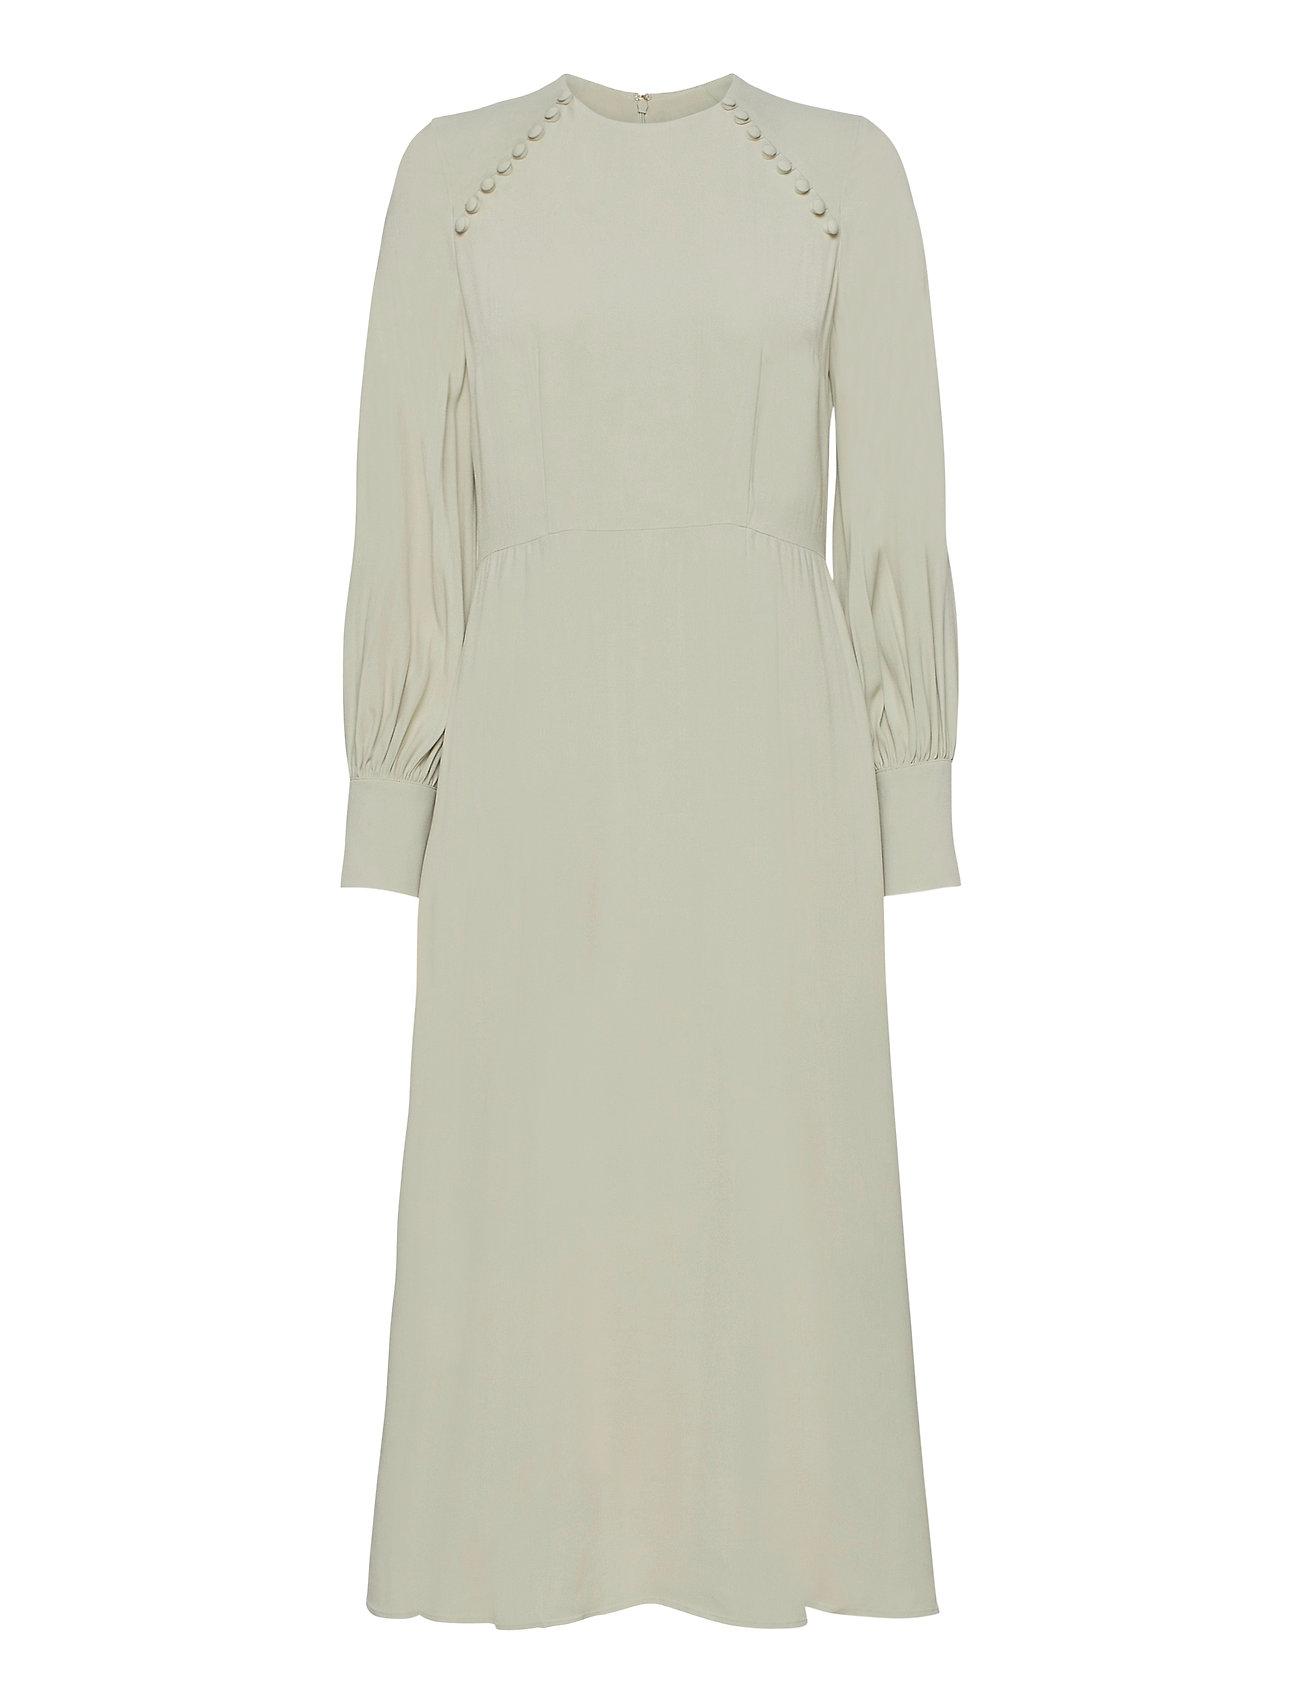 Image of Butt D Dress Midi Length Knælang Kjole Grøn Ivy & Oak (3475360281)